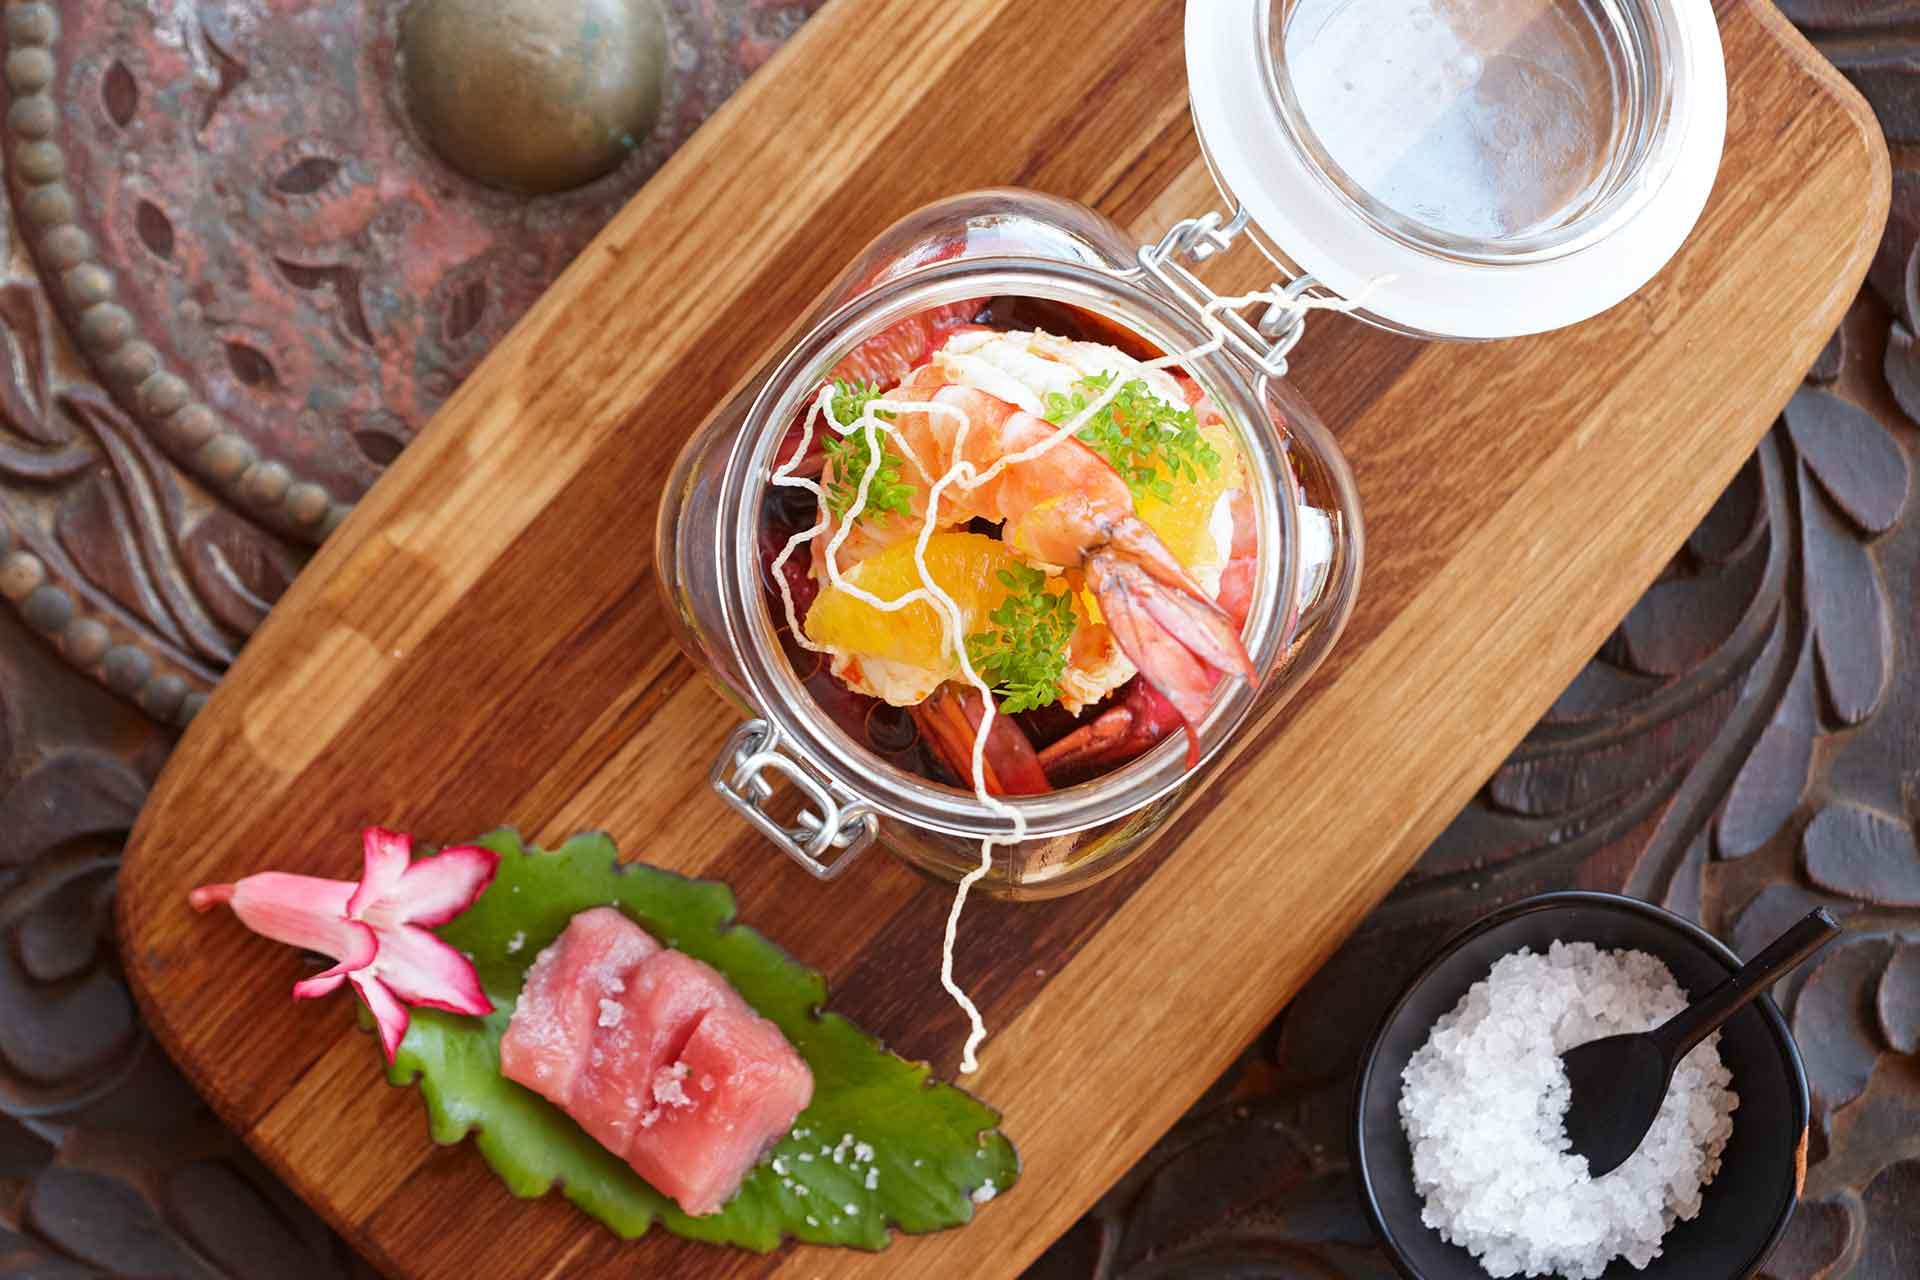 A seafood salad dish at AVANI Pemba Beach Hotel